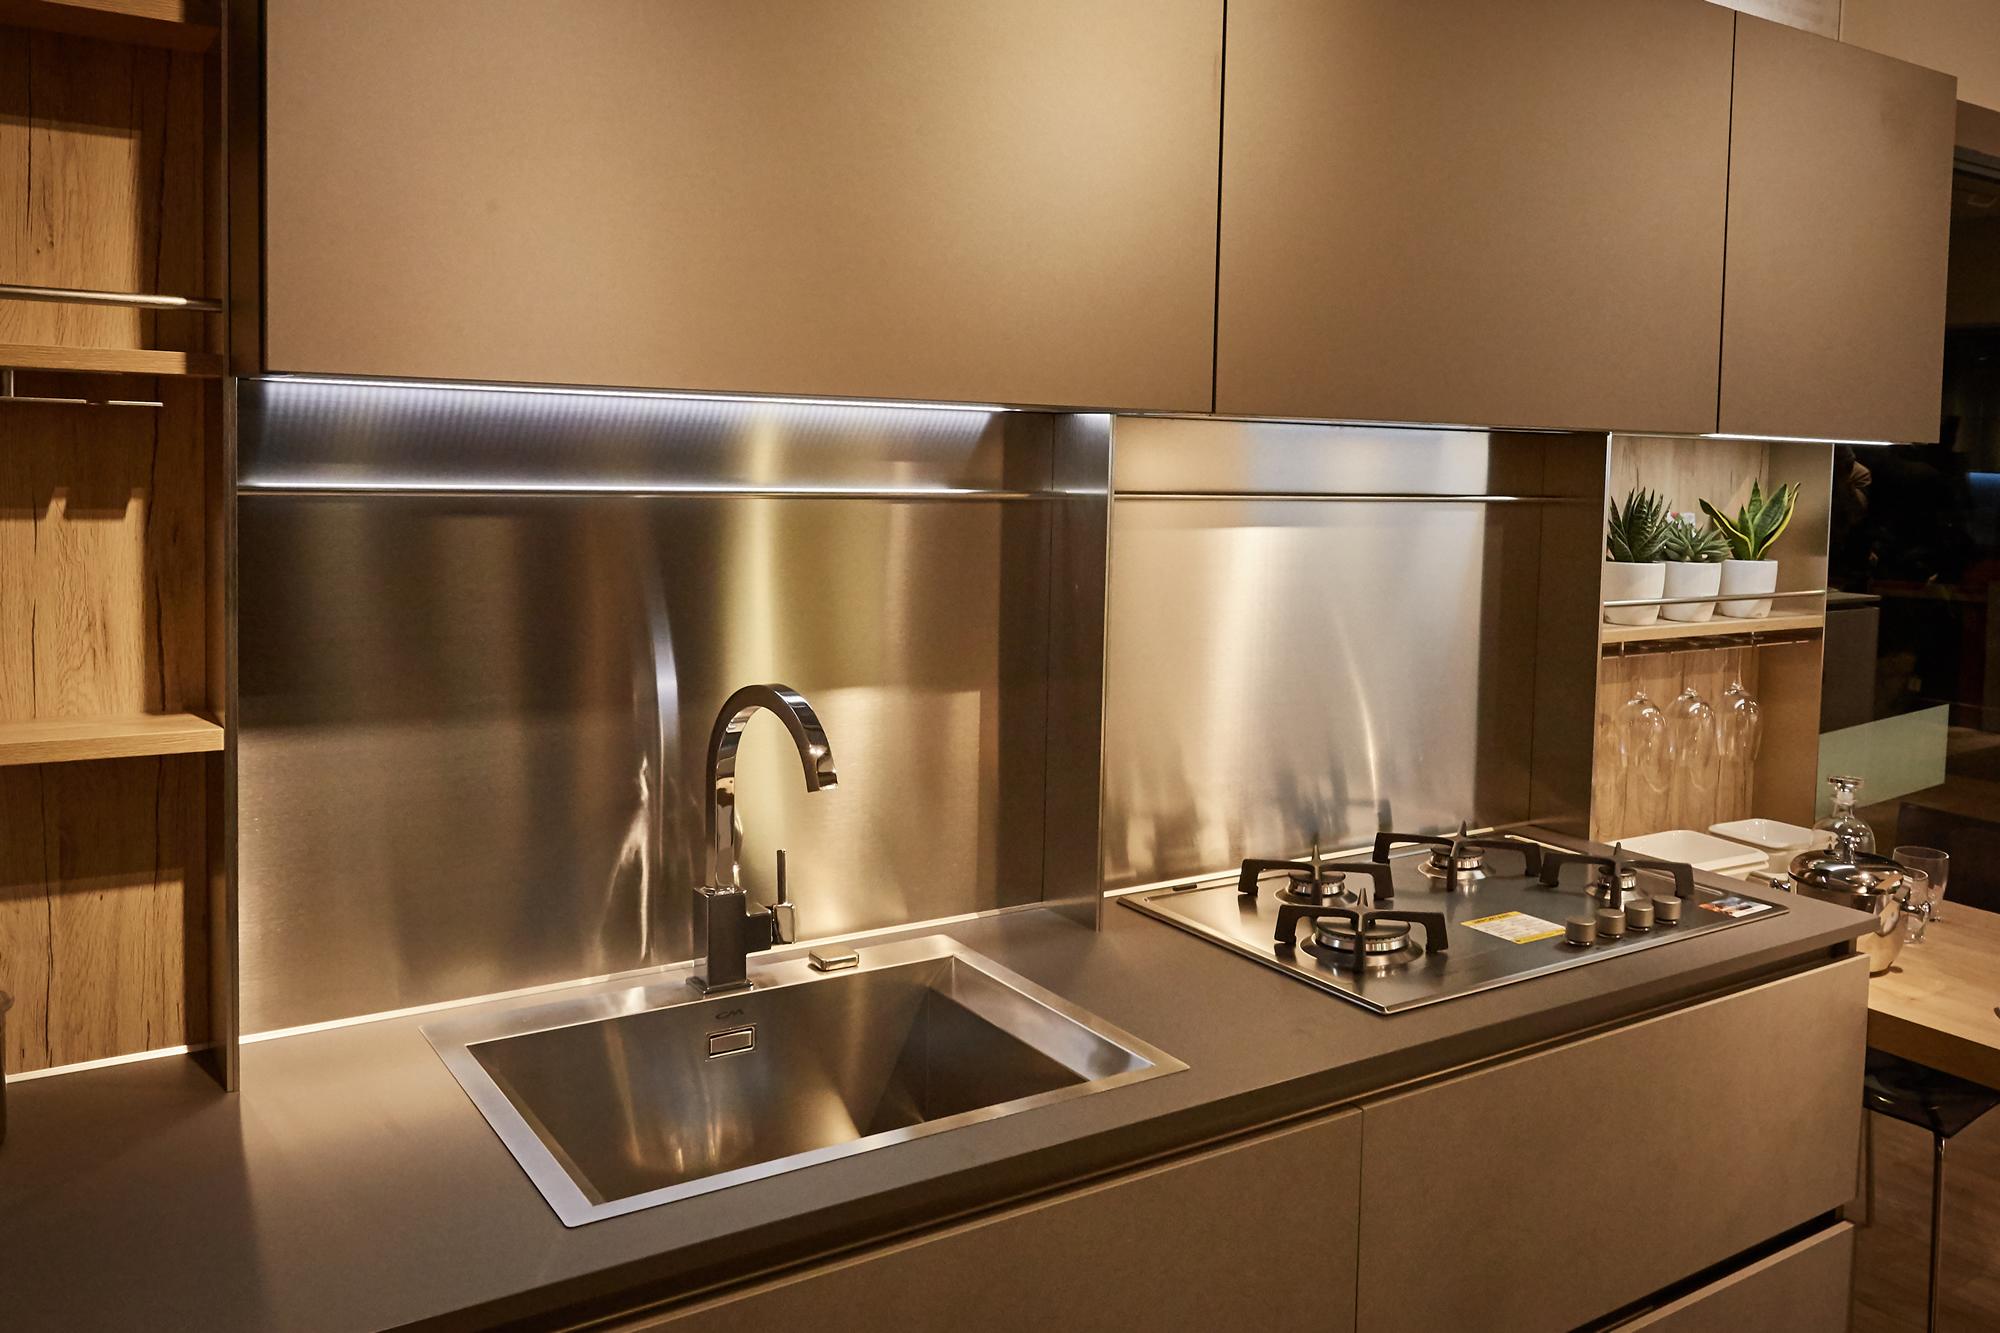 Veneta Cucine Store - Strippoli Mobili Corato Home Design | Kitchen ...